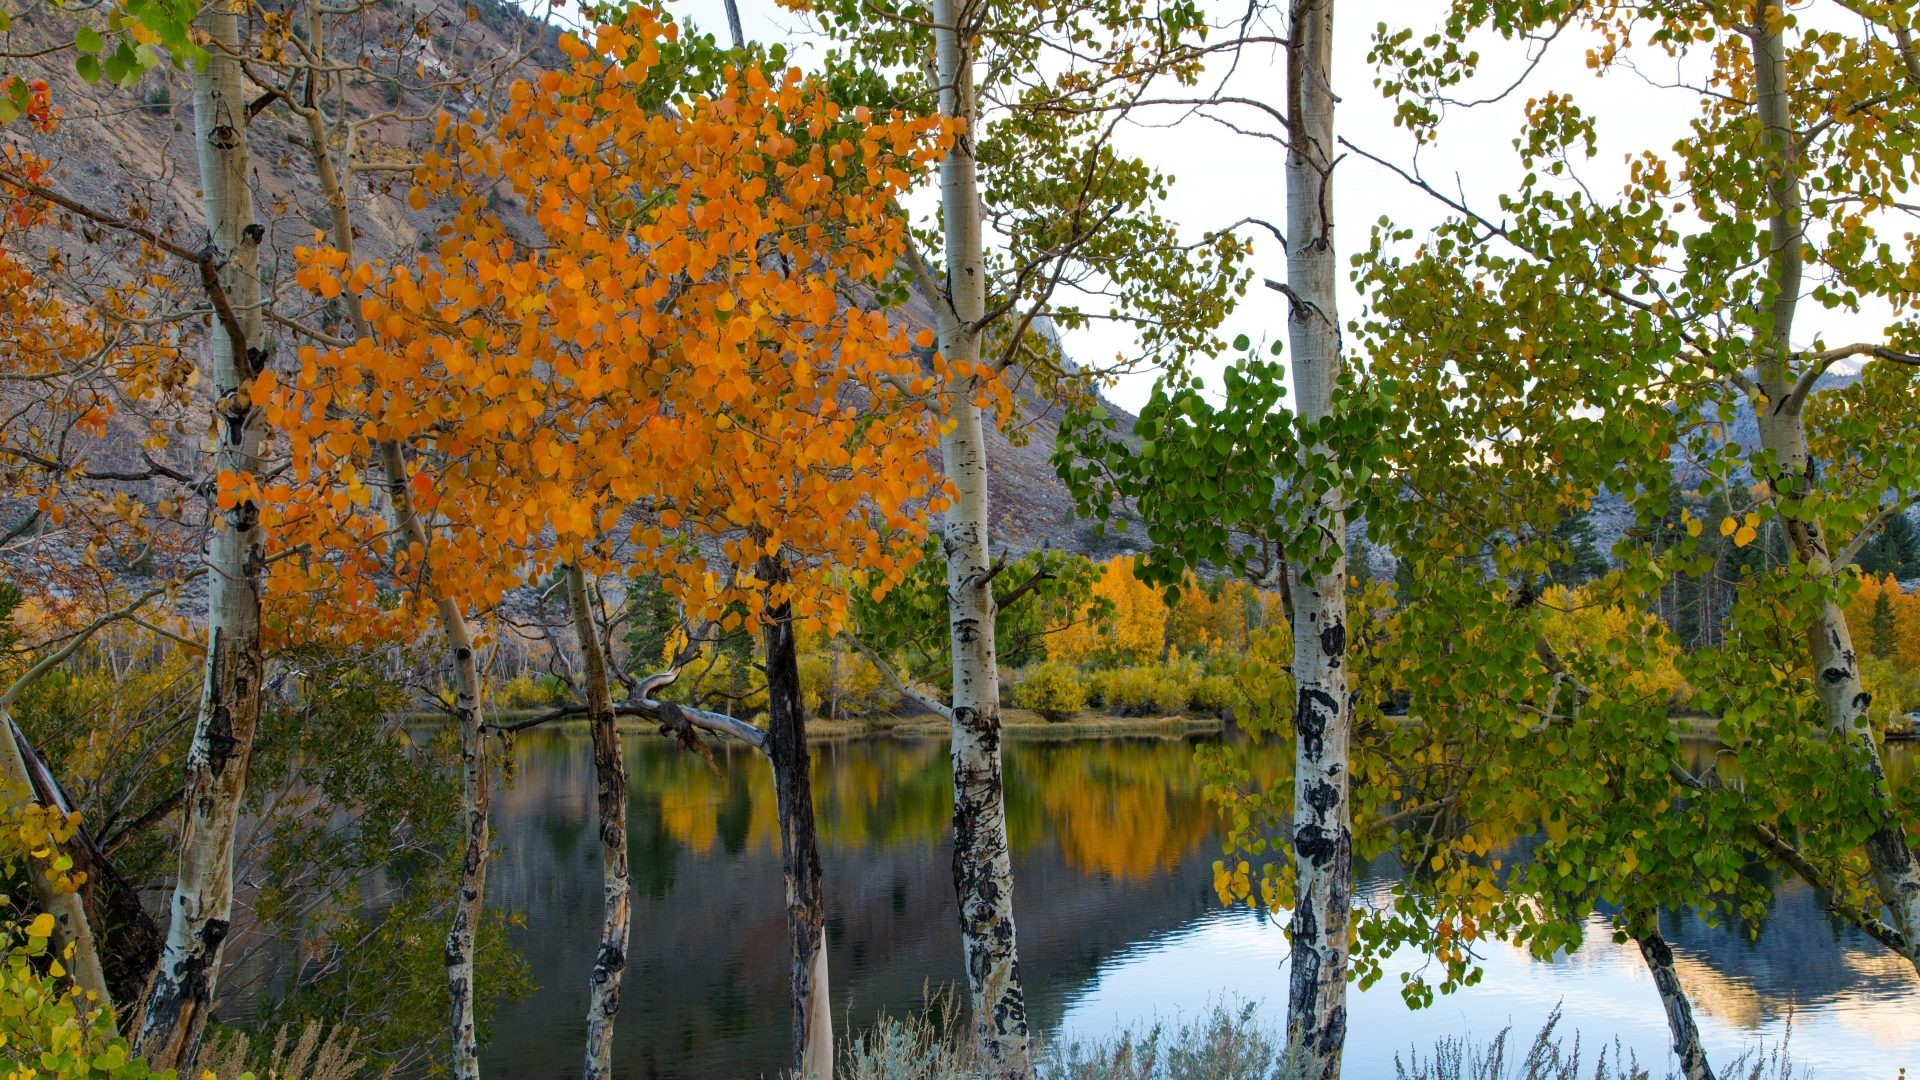 Autumn Tag – Birch Autumn Trunk Lake Nature Tree Beautiful Hd Wallpapers  Desktop for HD 16